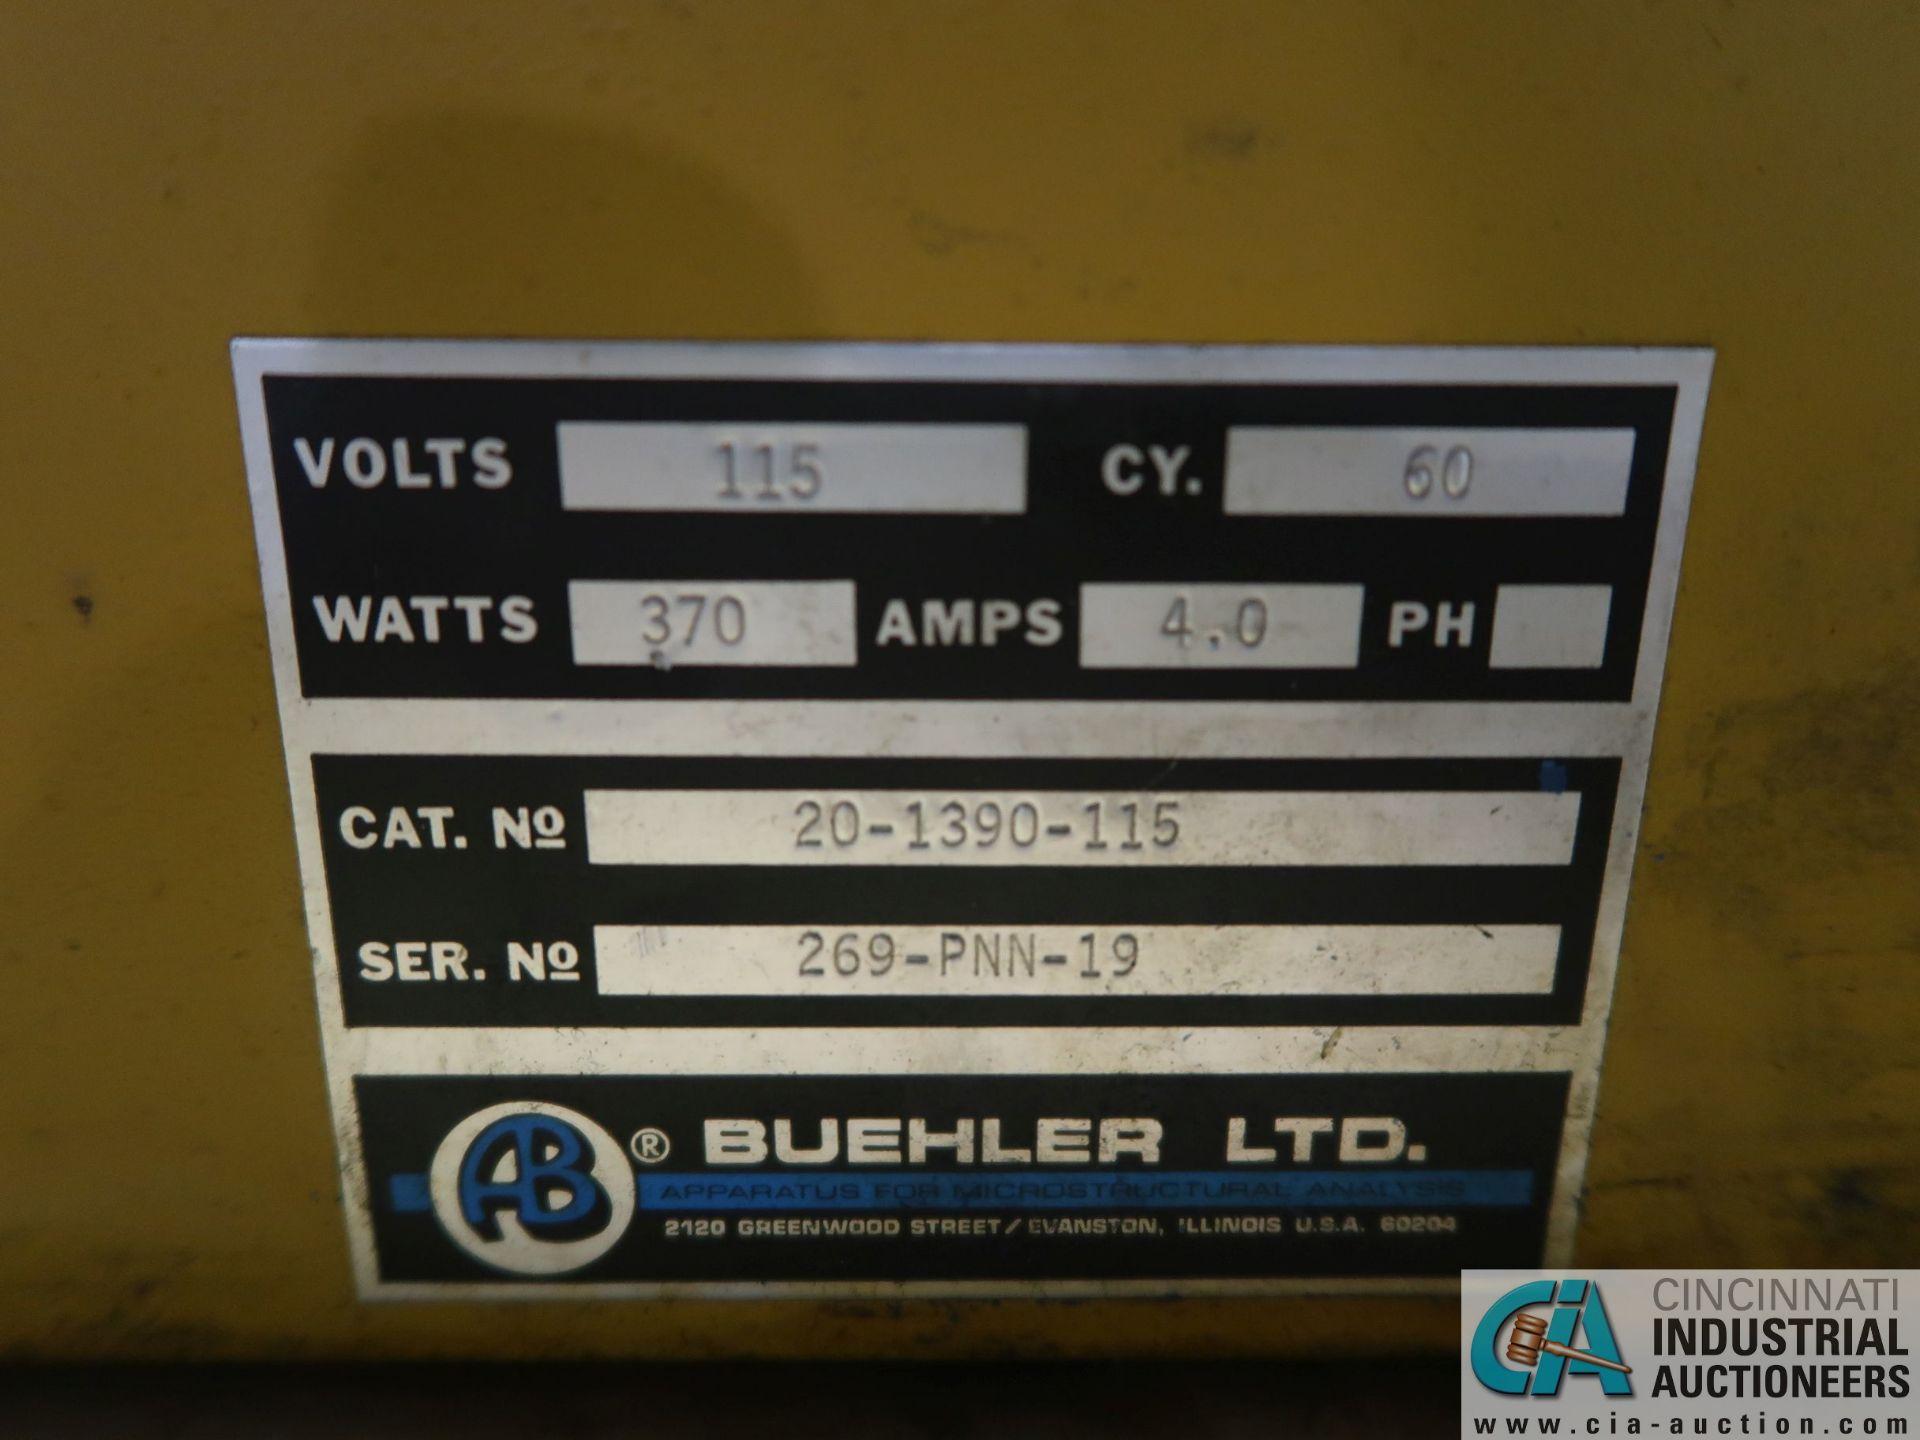 Lot 54 - BUEHLER PNEUMET I MODEL 20-1390-115 MOUNTING PRESS; S/N 269-PNN-19, WITH MODEL 20-2223 WORKHEAD,